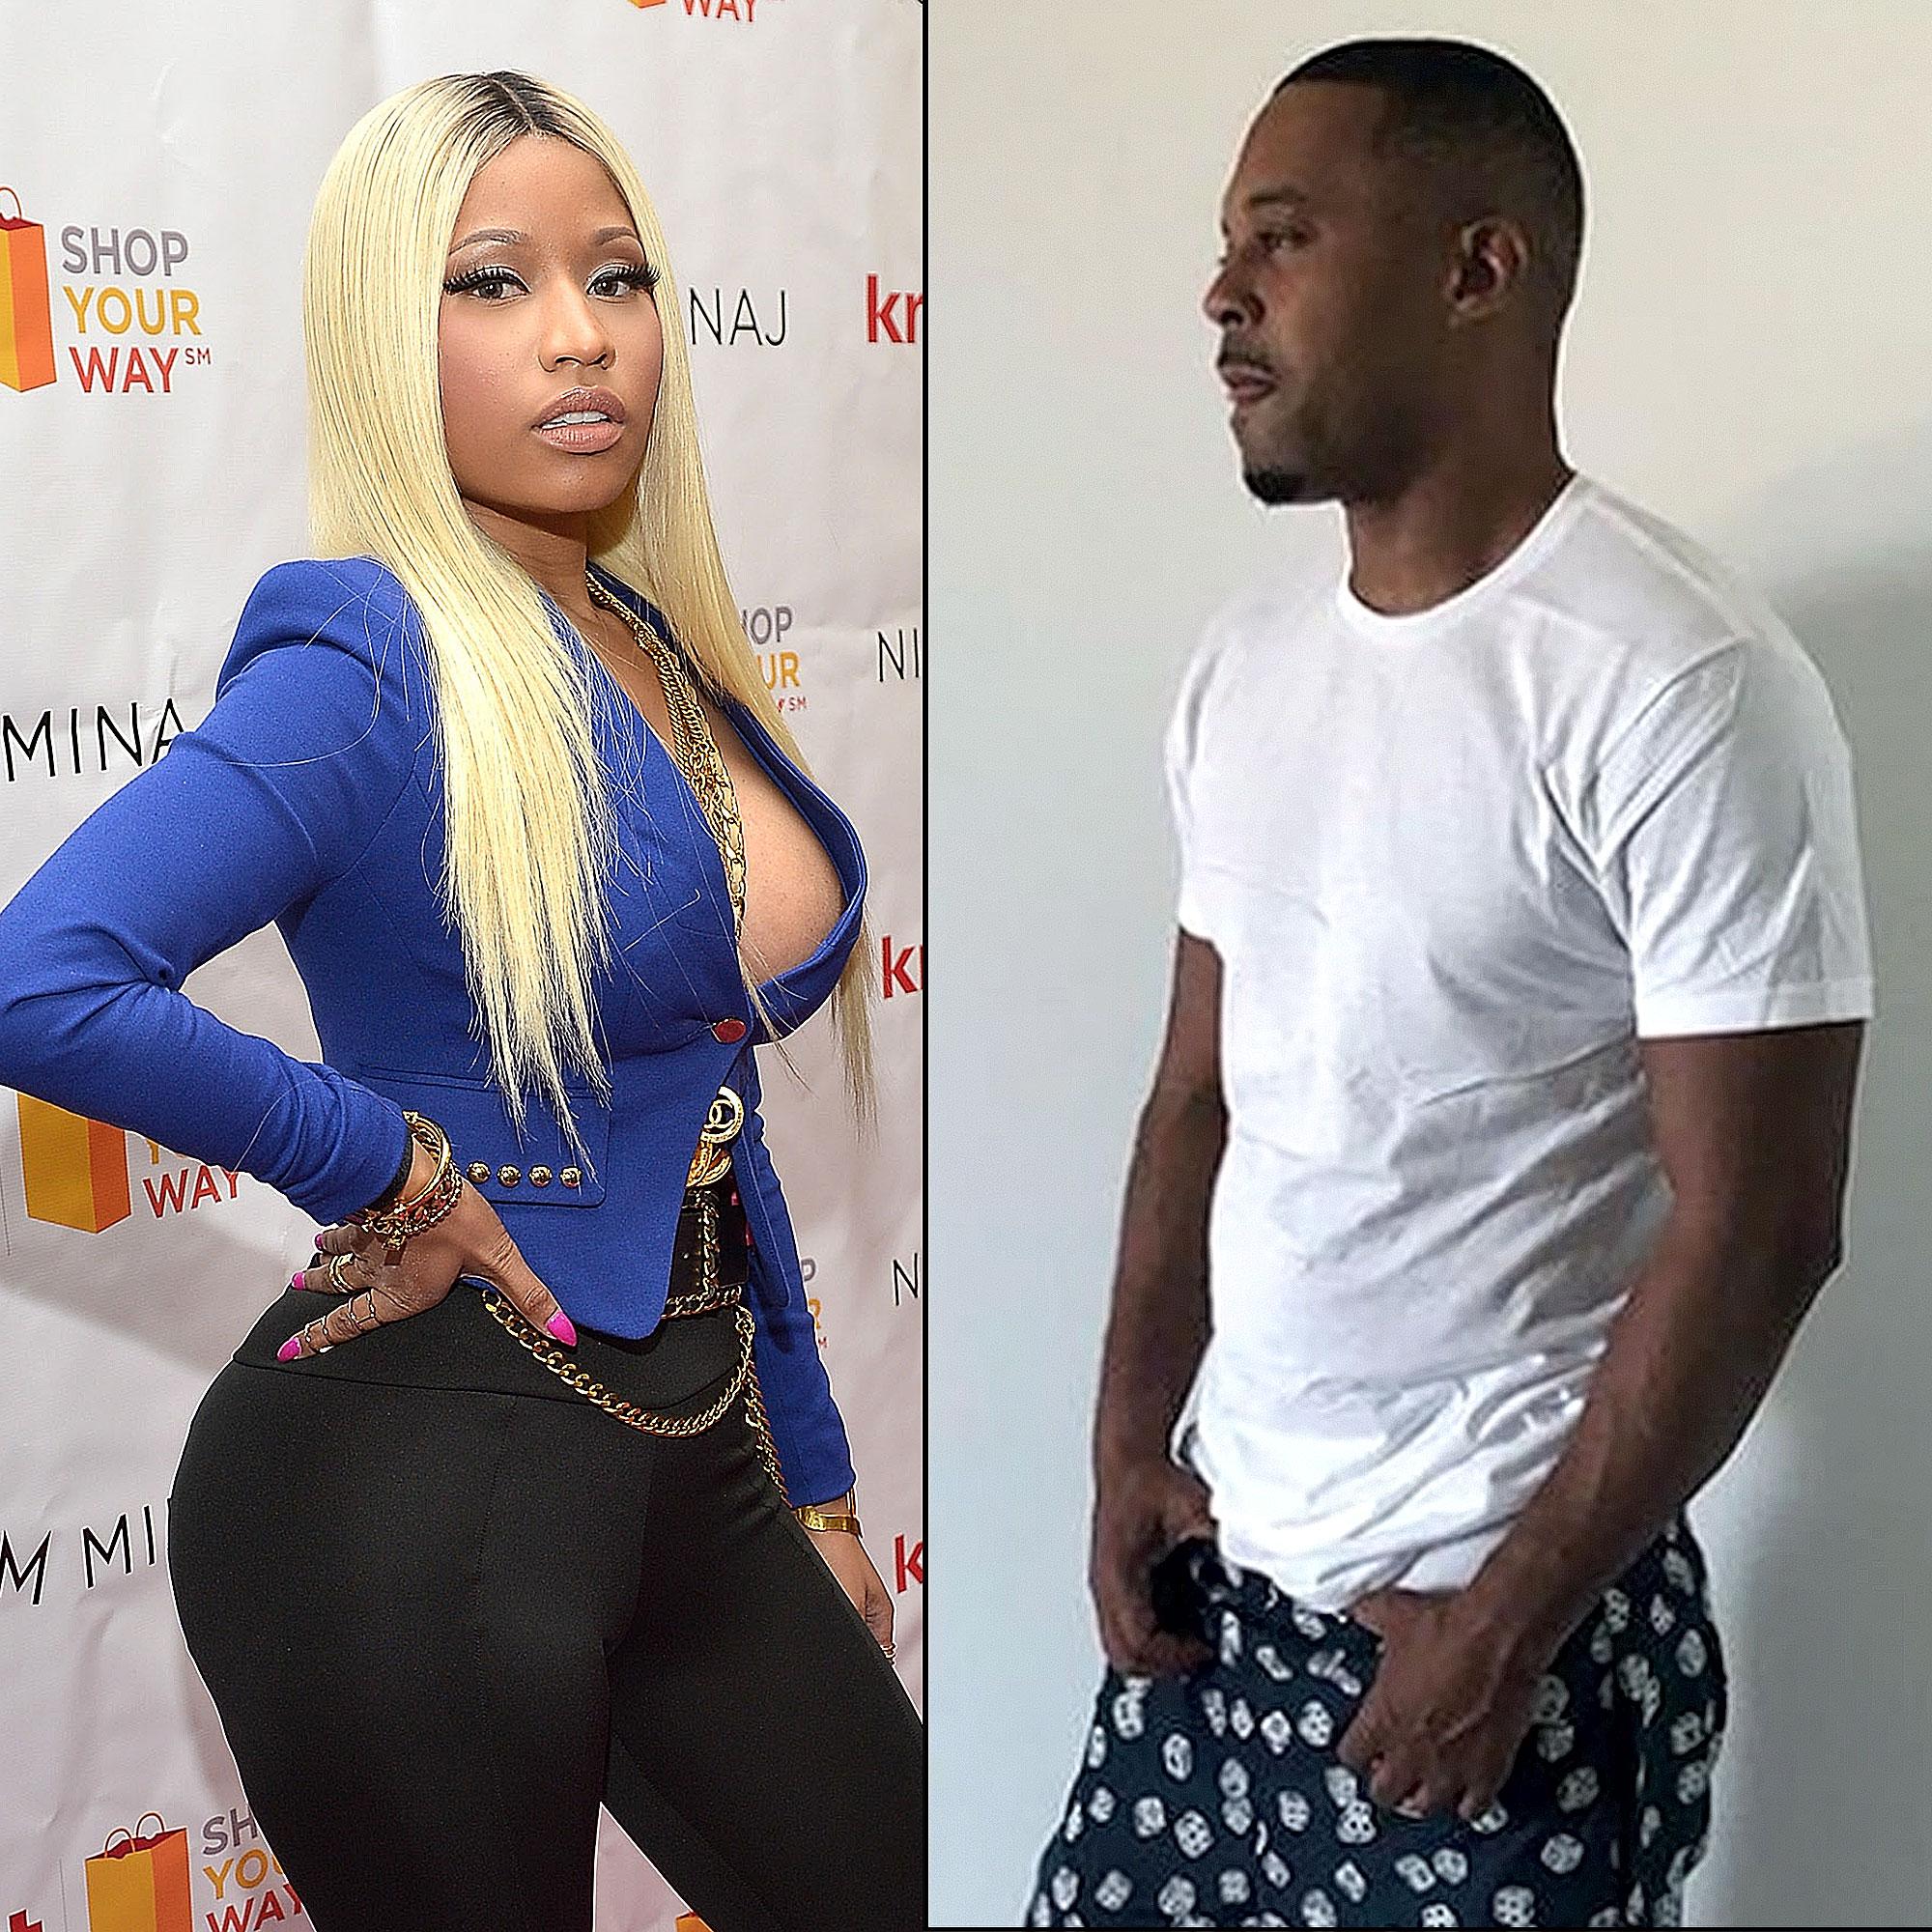 Nicki Minaj Shares New Video With Boyfriend Kenneth Petty - People Criticize Her